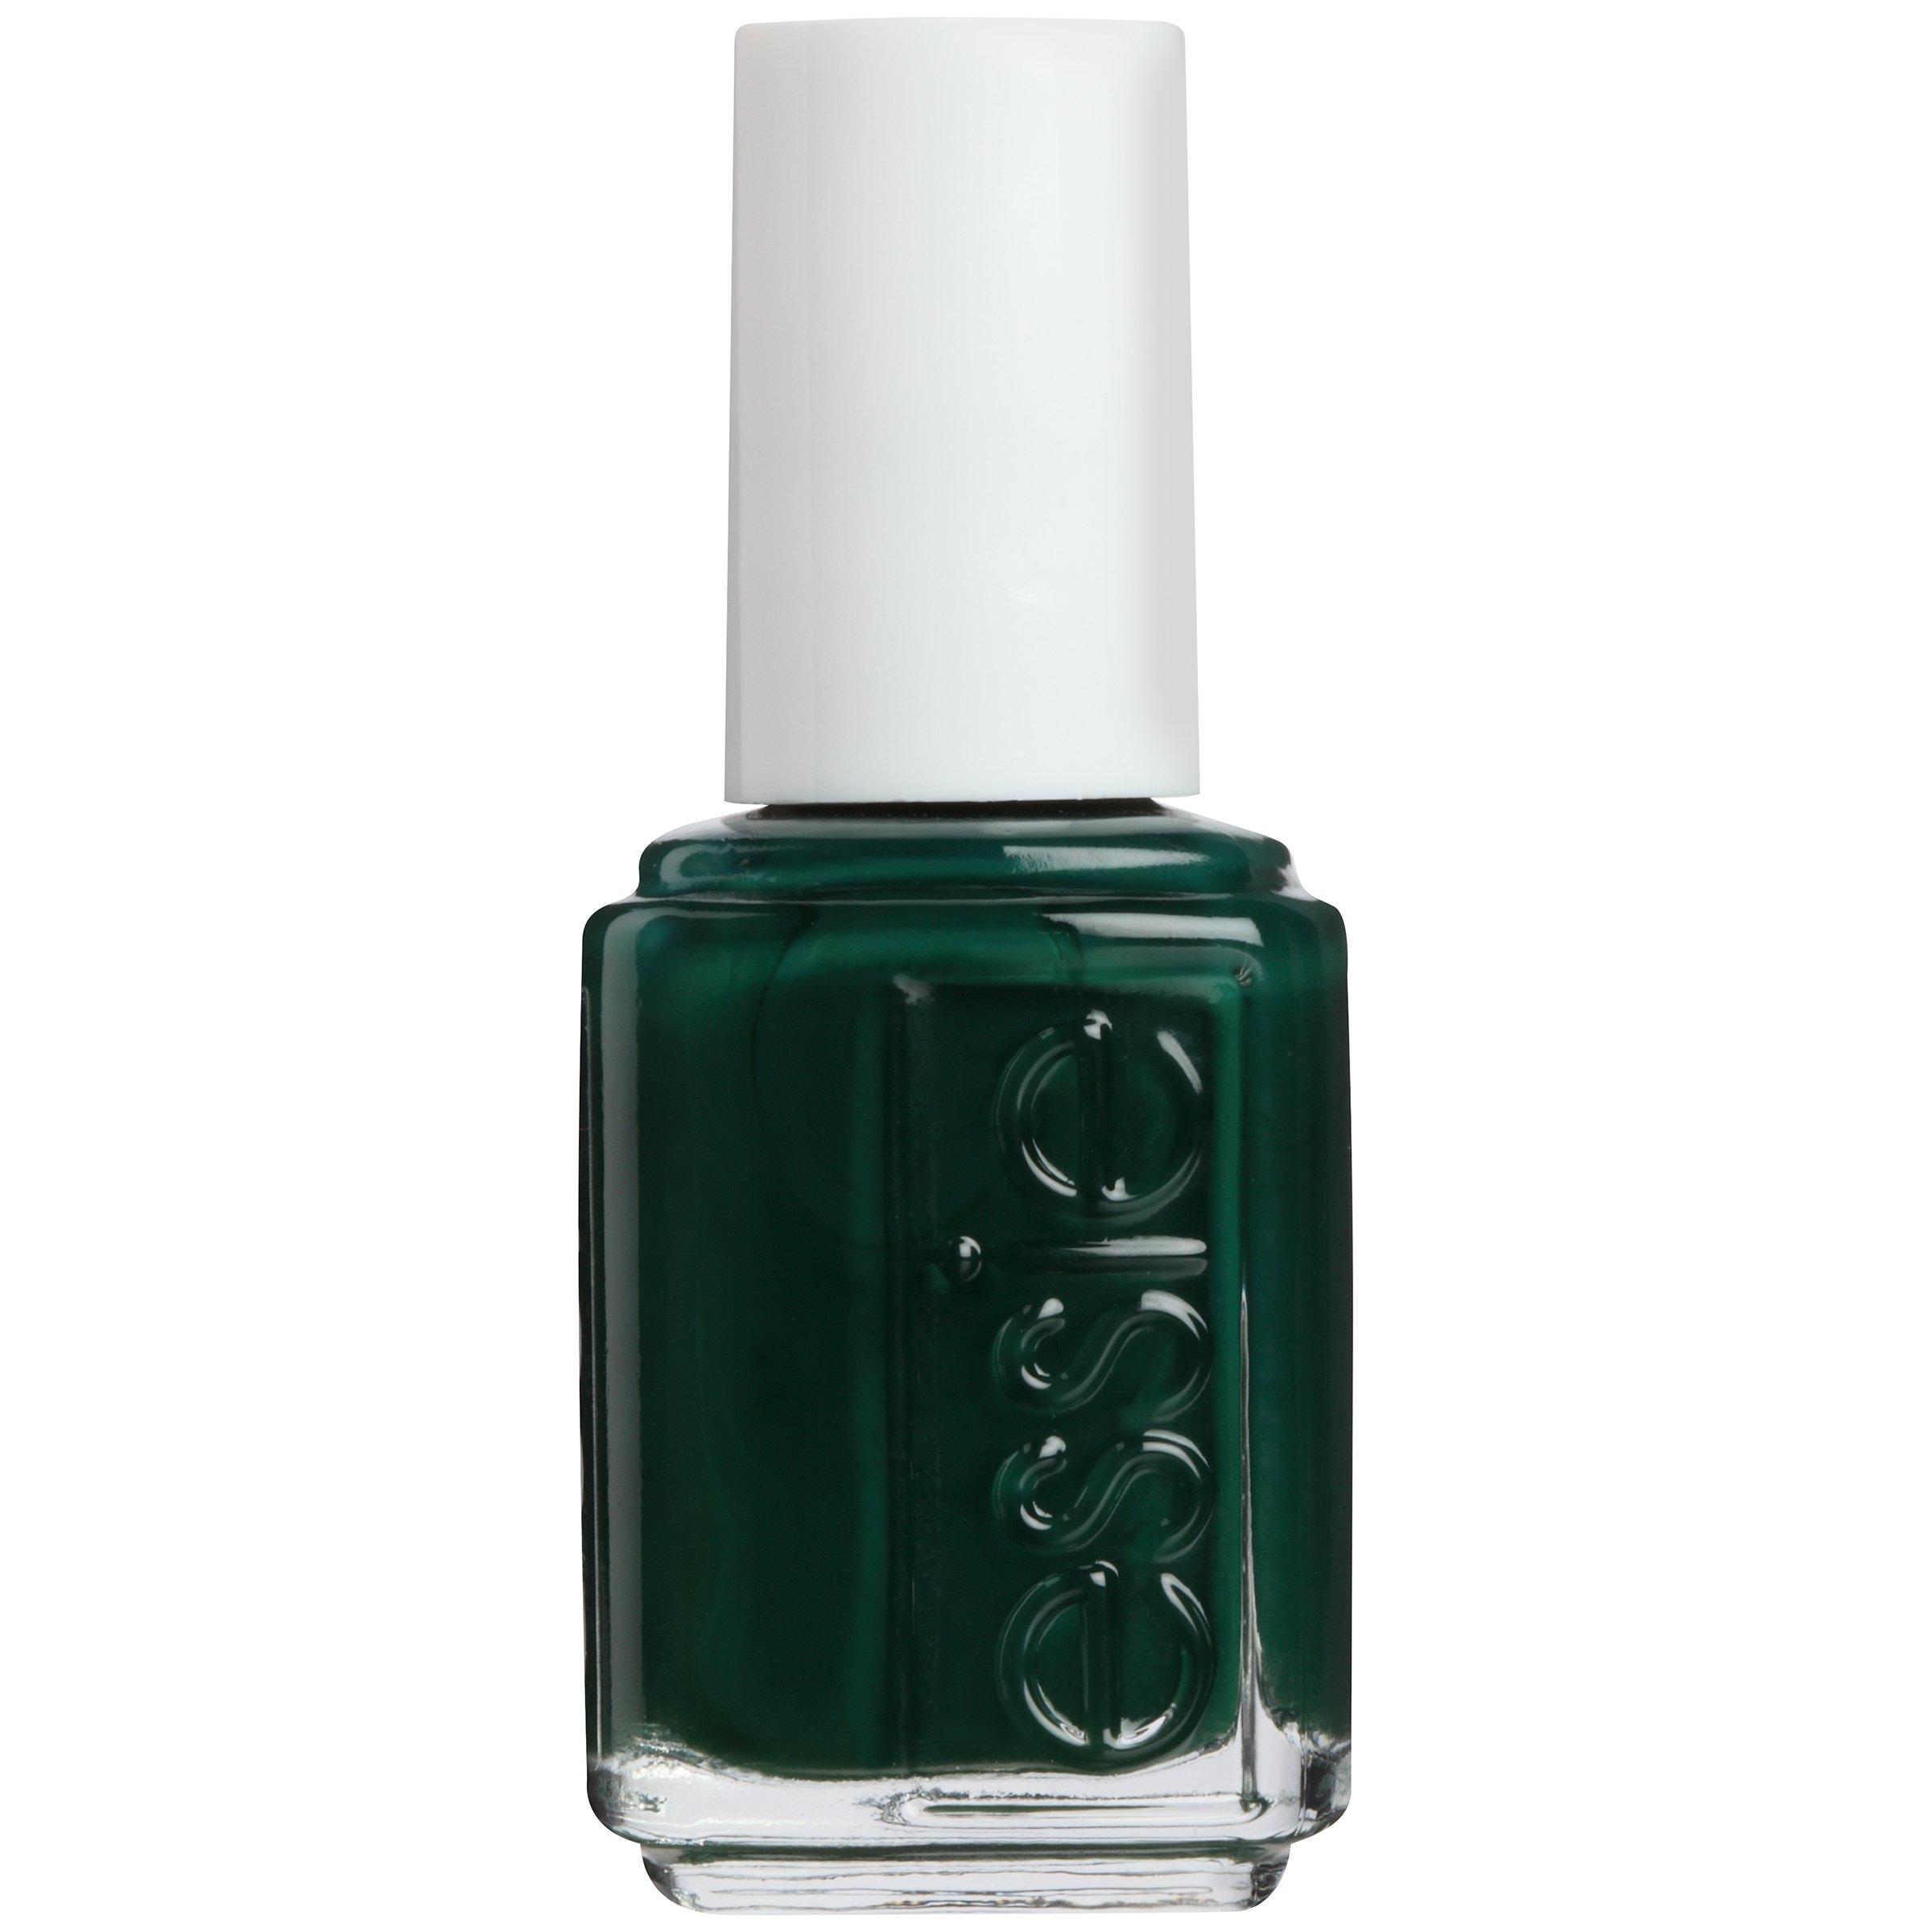 Amazon.com : essie nail polish, off tropic, green nail polish, 0.46 ...